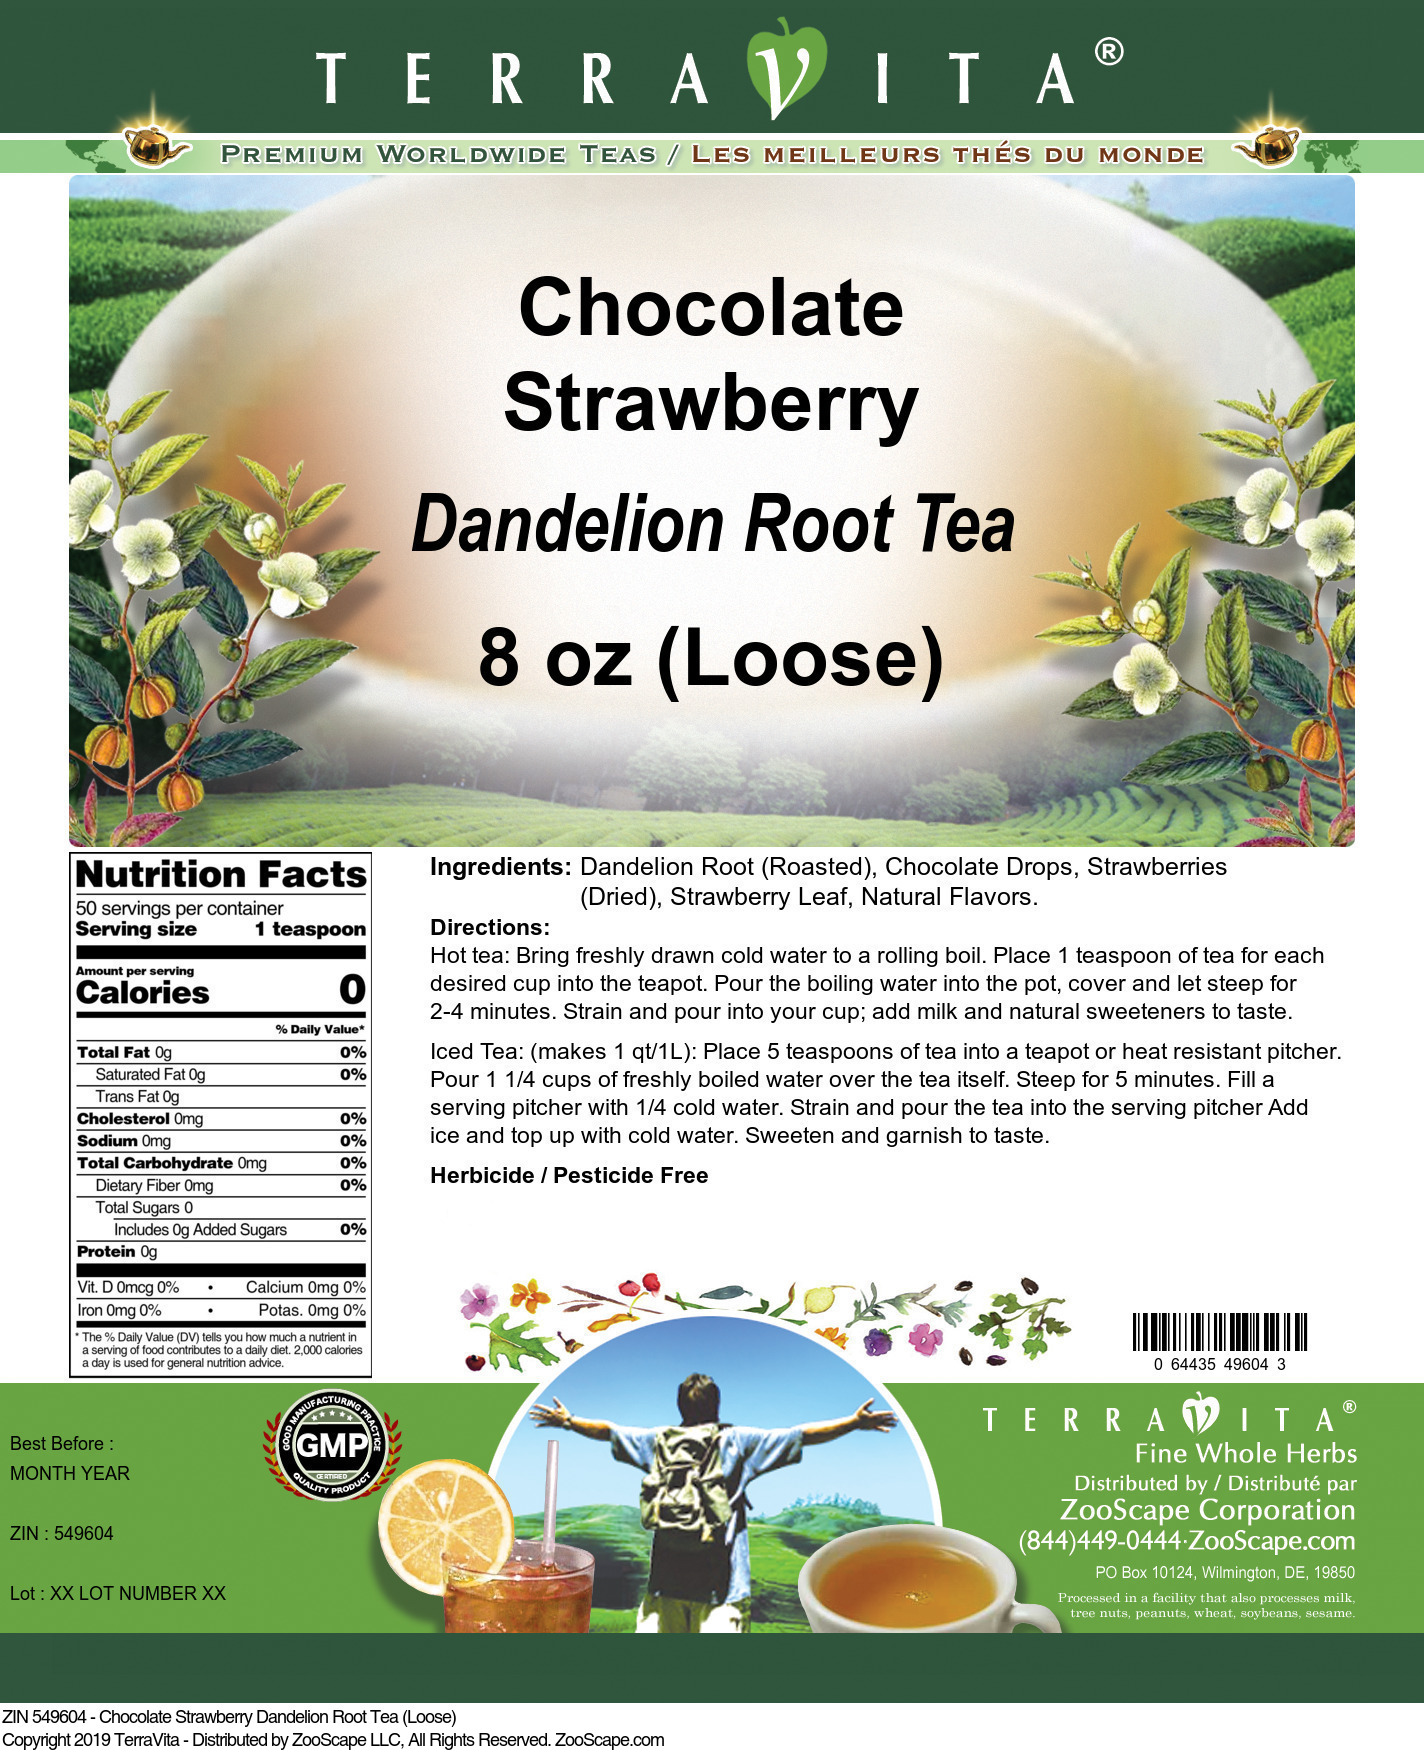 Chocolate Strawberry Dandelion Root Tea (Loose)